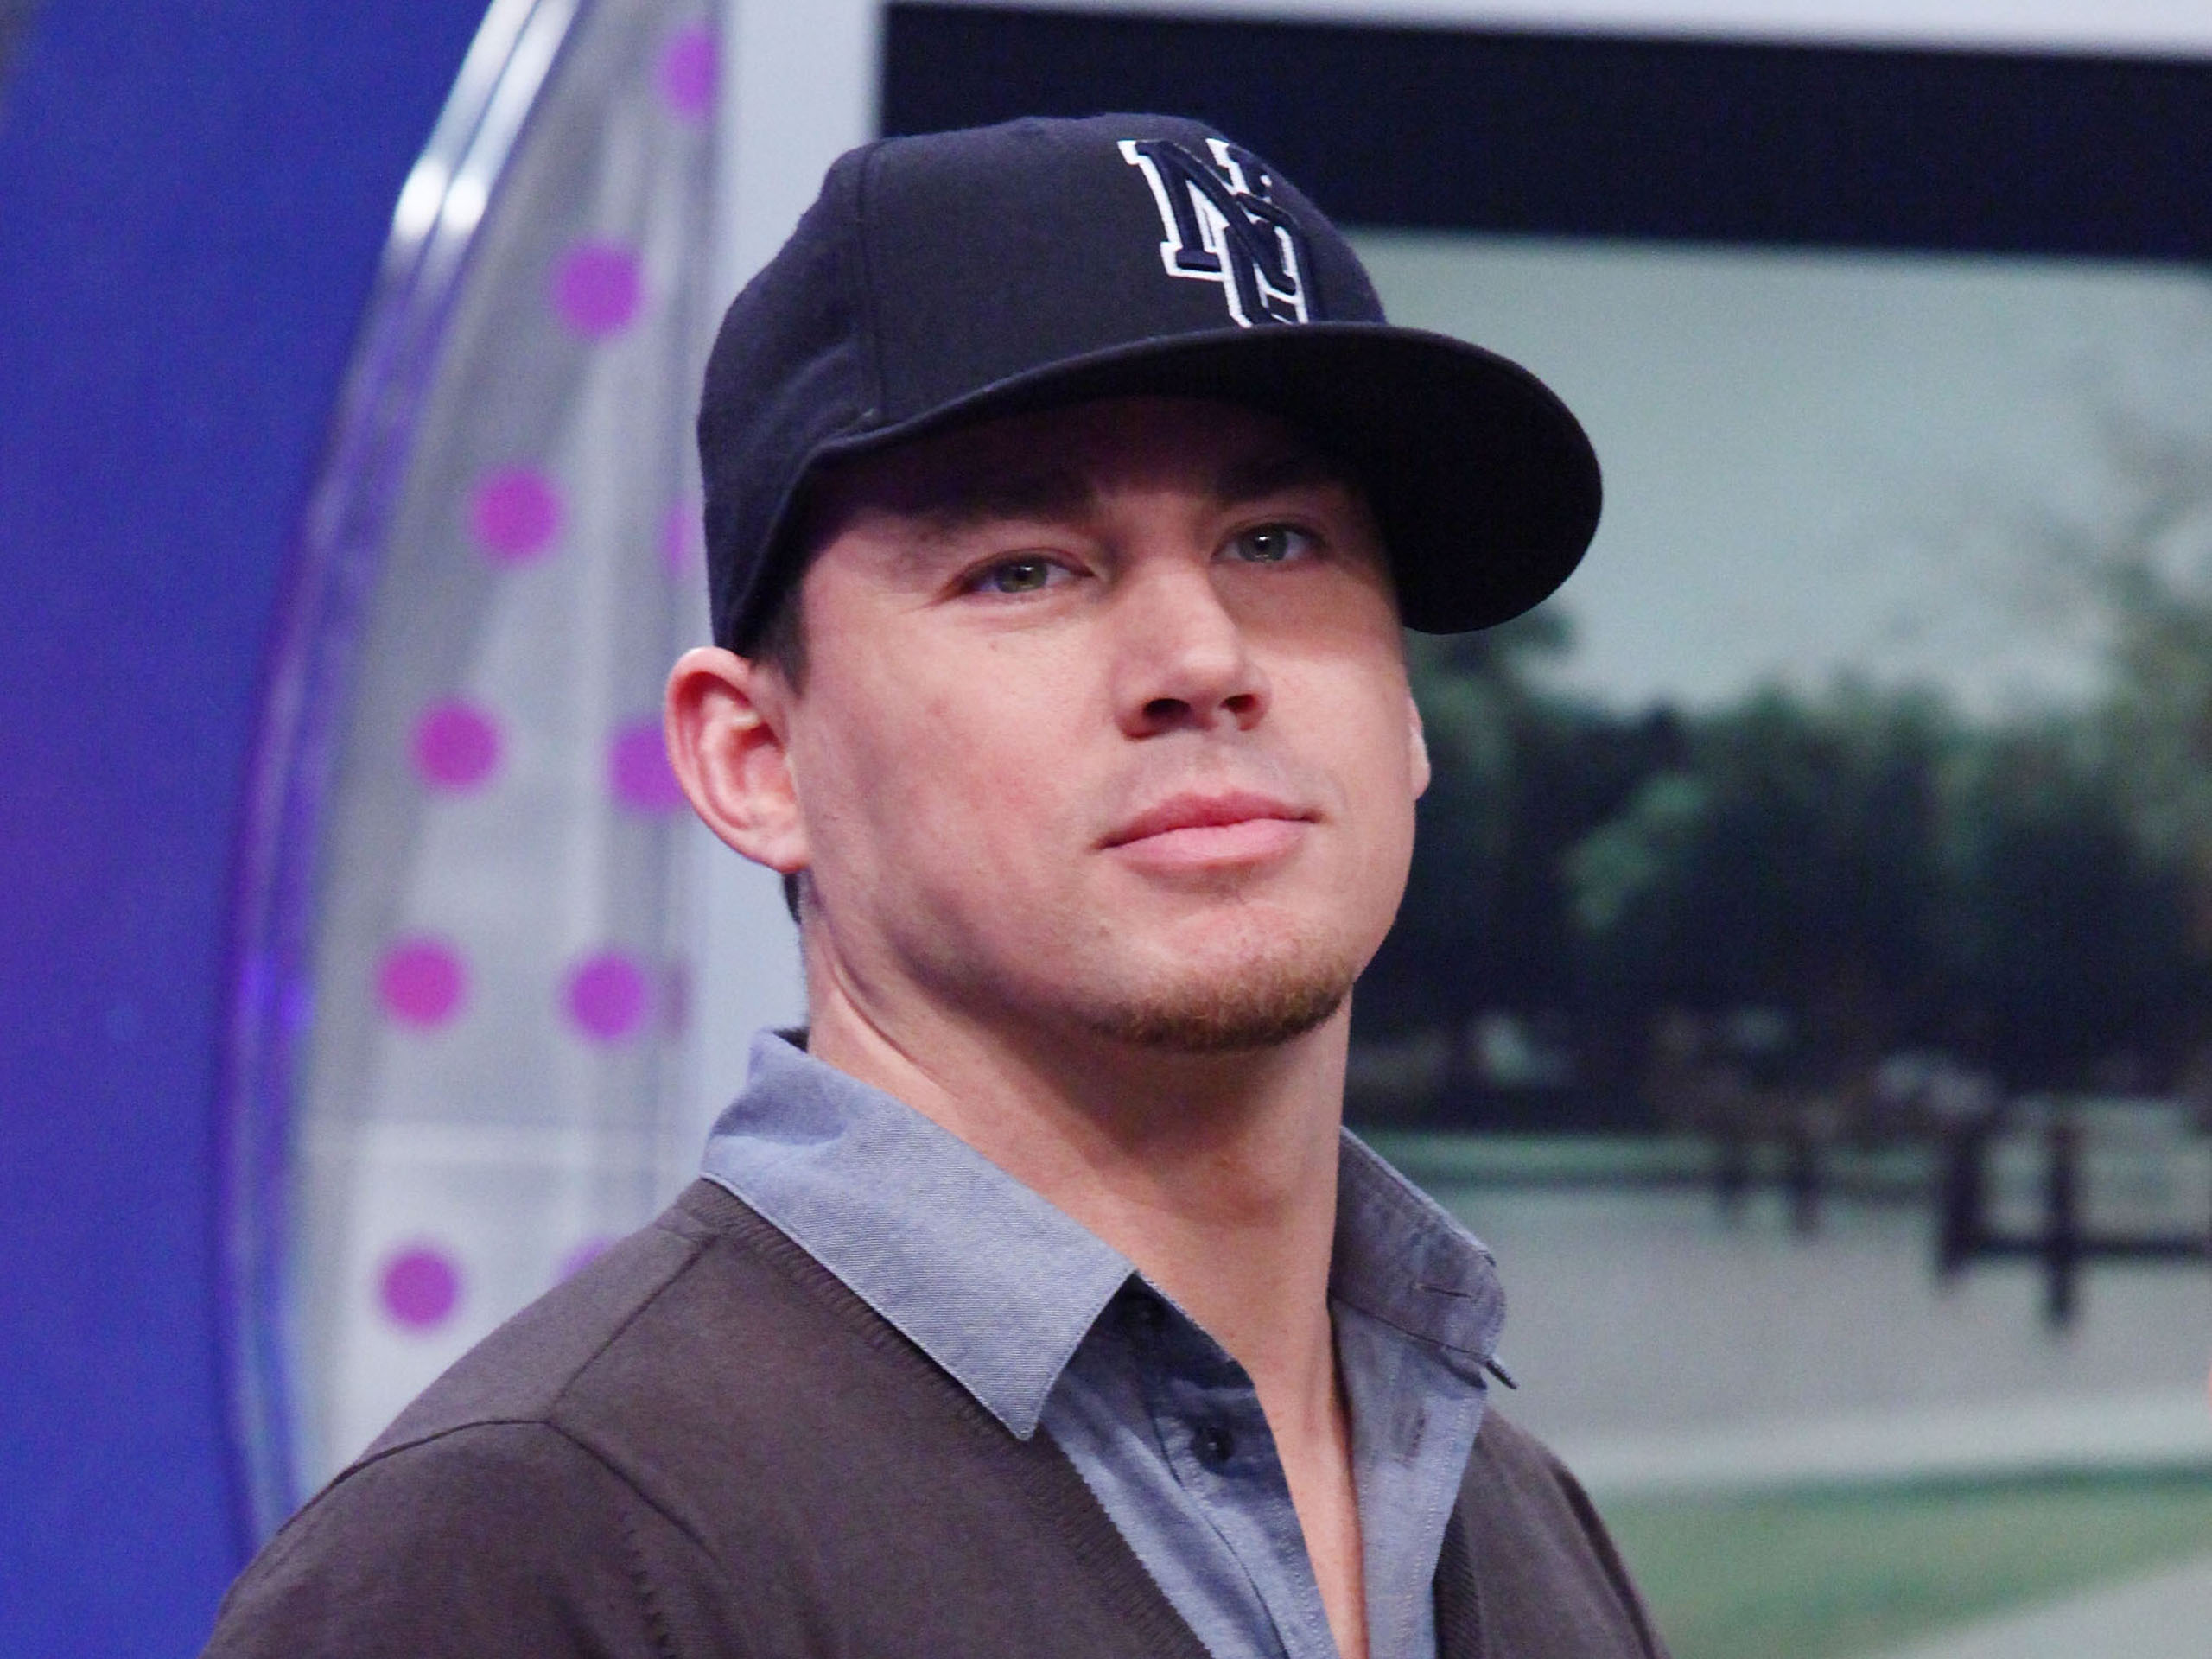 Channing Tatum Loves Hats (But They Don't Love Him ... Channing Tatum